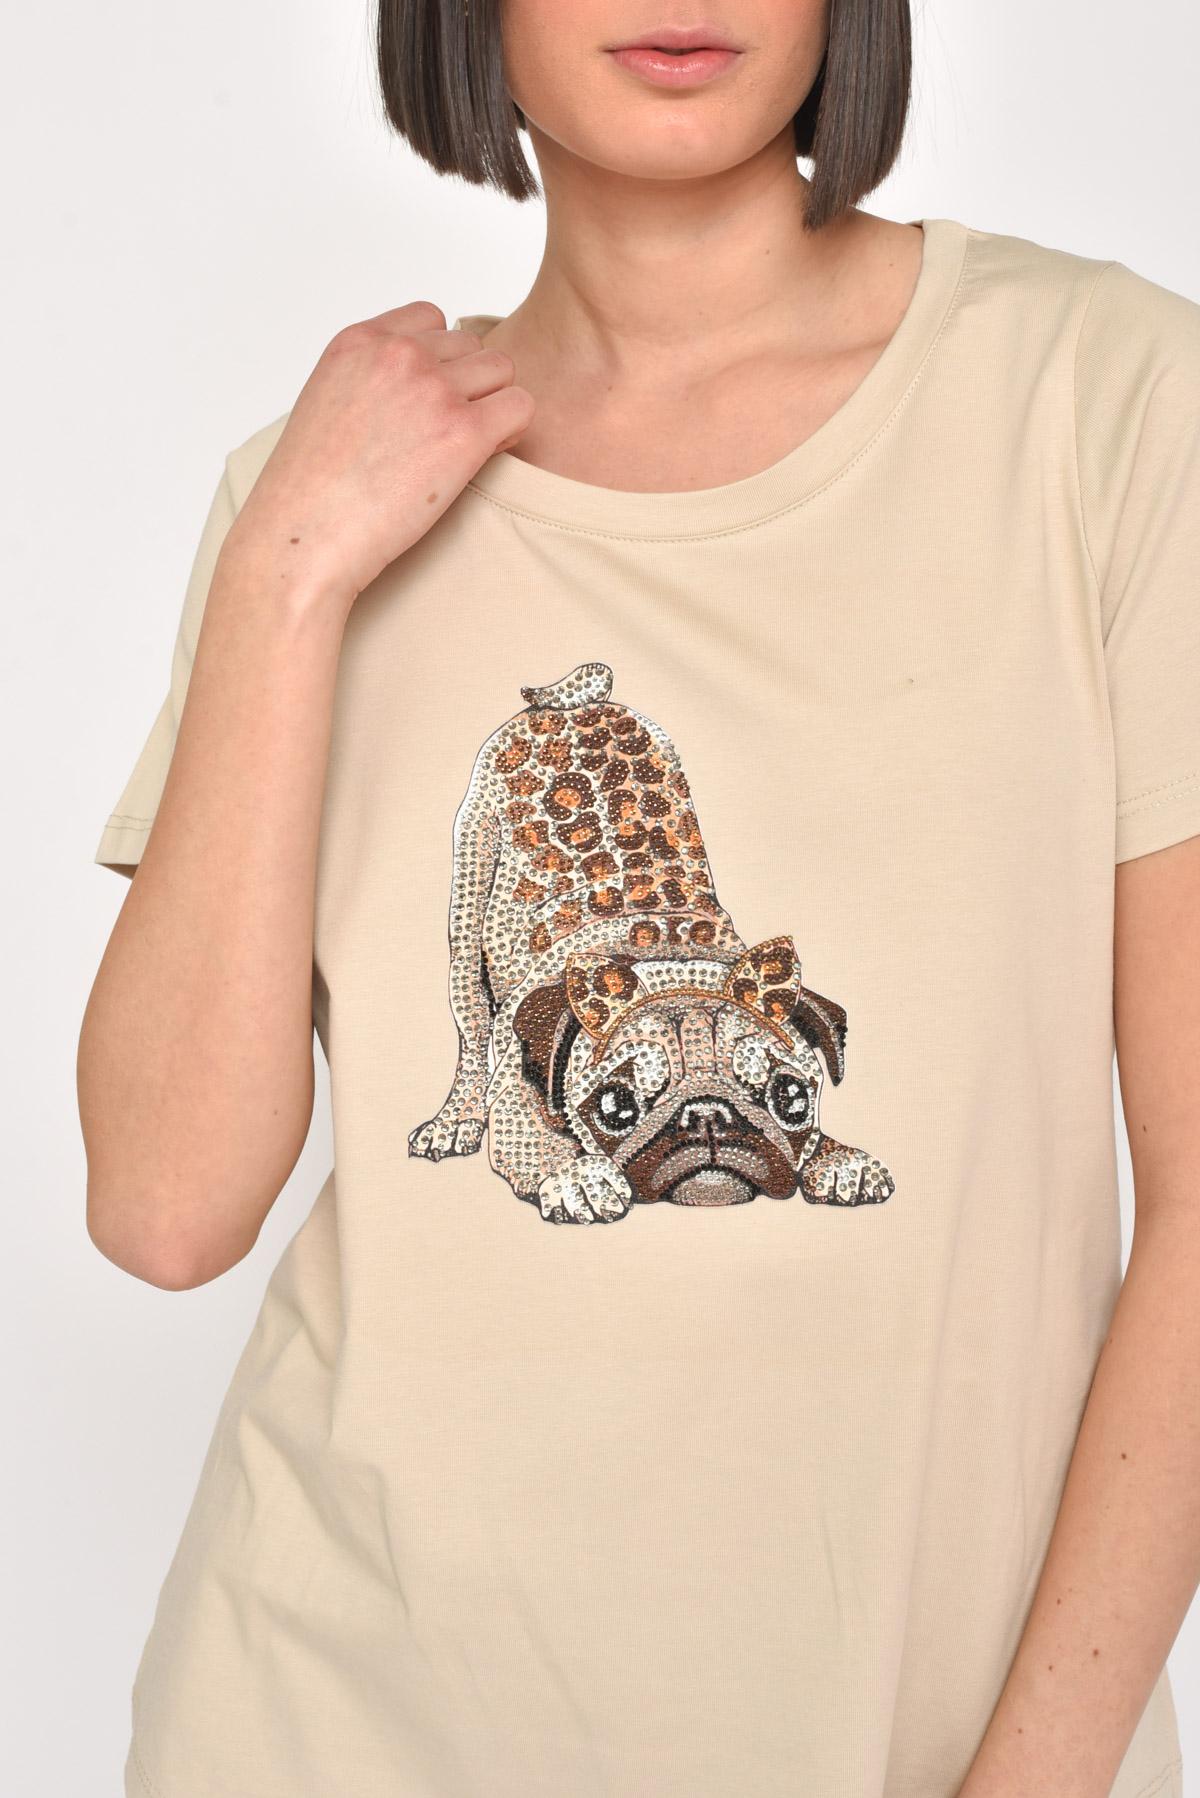 T-SHIRT CARLINO CON STRASS for women -  - Paquito Pronto Moda Shop Online